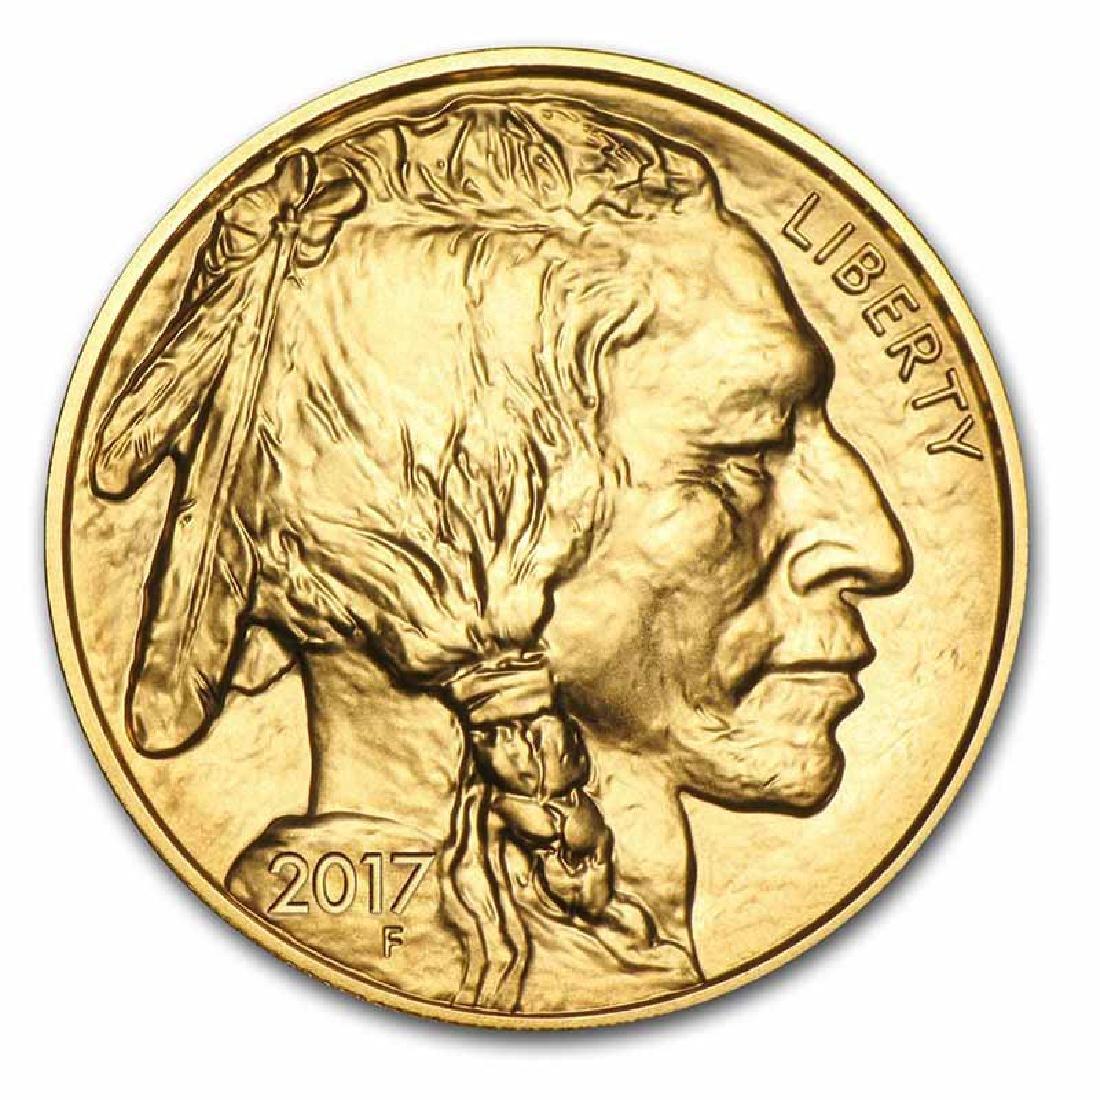 Uncirculated Gold Buffalo Coin One Ounce 2017